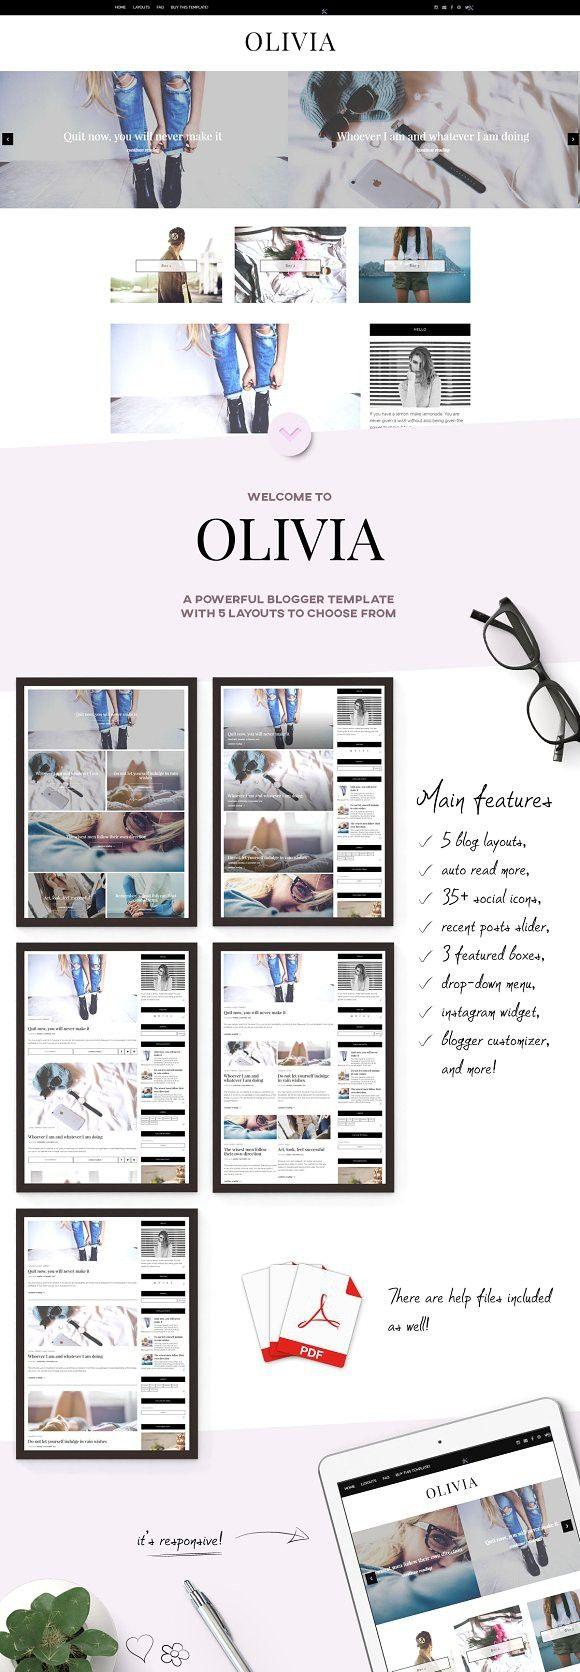 Responsive blogger template olivia blogger templates tumblr and responsive blogger template olivia maxwellsz